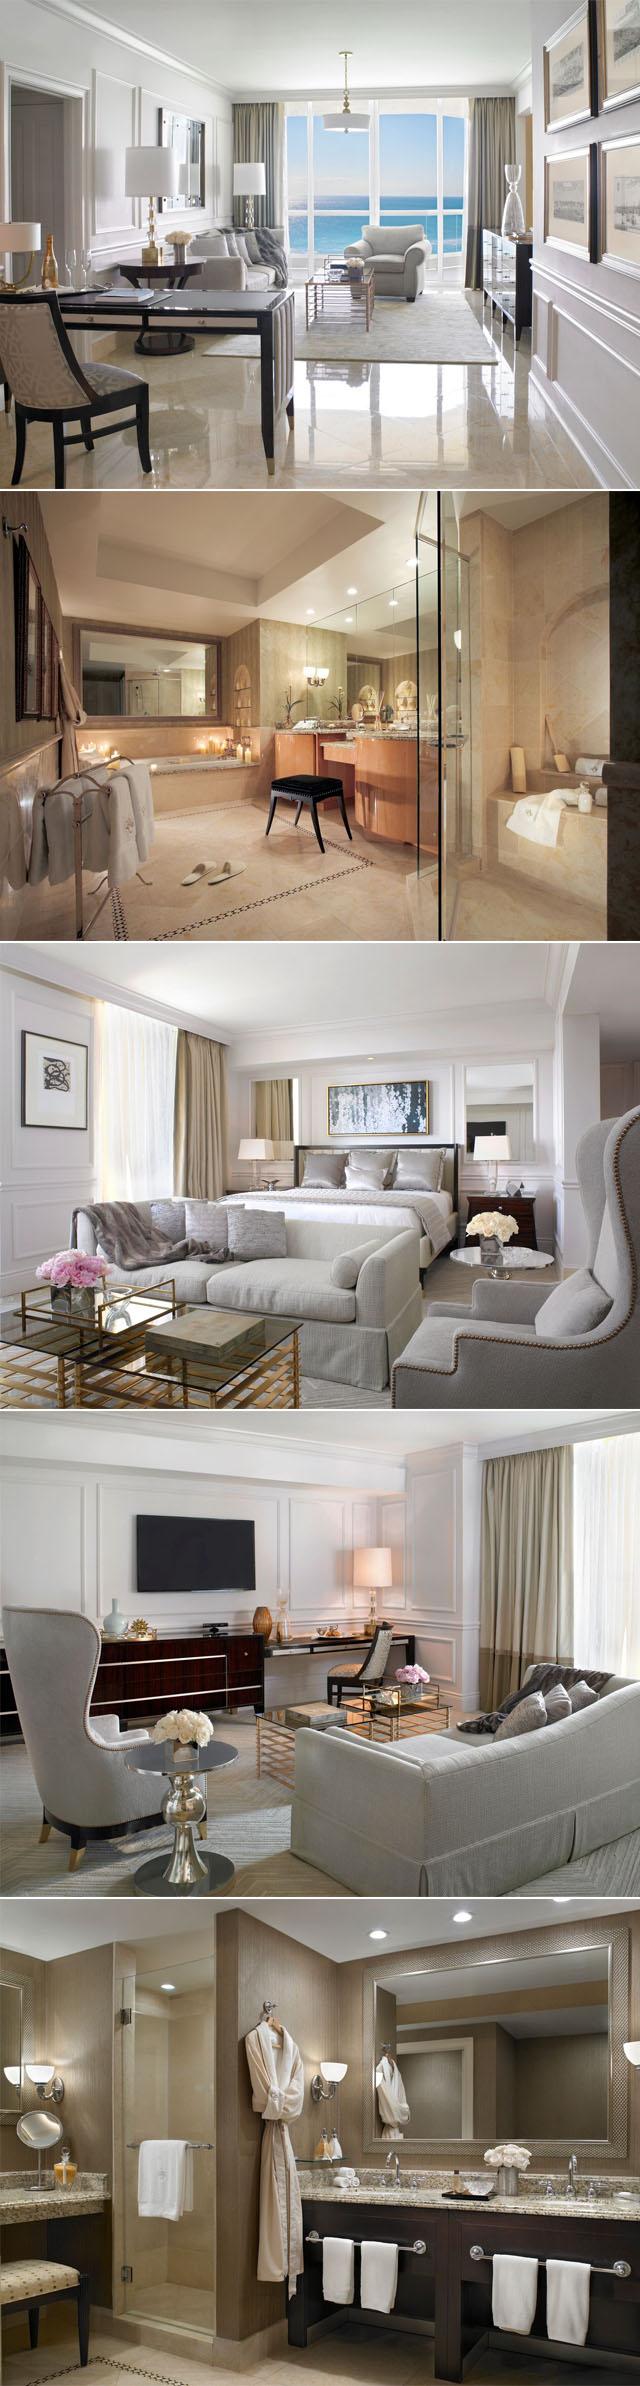 acqualina-rooms